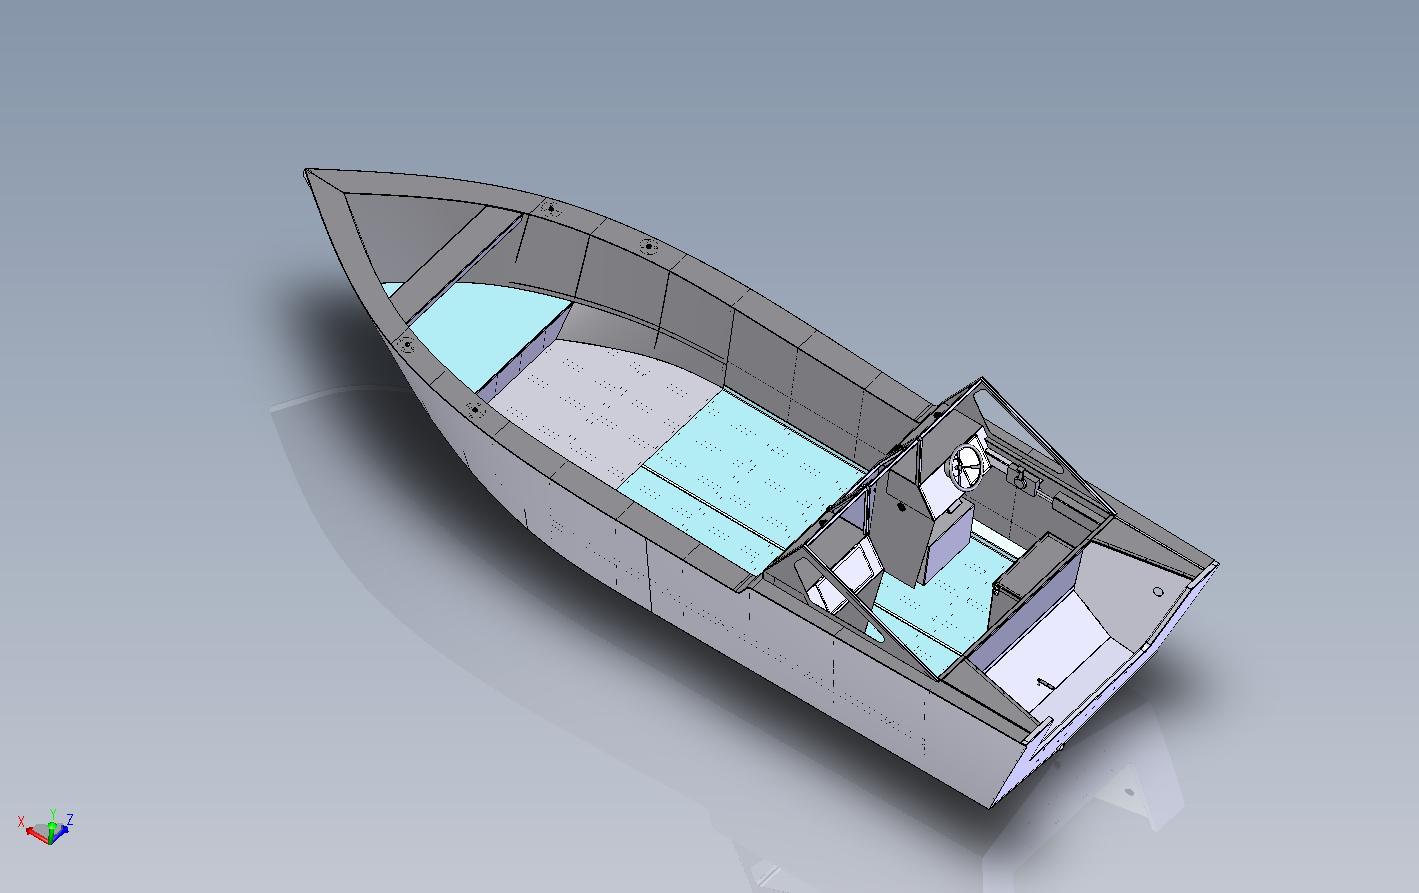 Aluminum Fishing Boat Plans | www.galleryhip.com - The ...